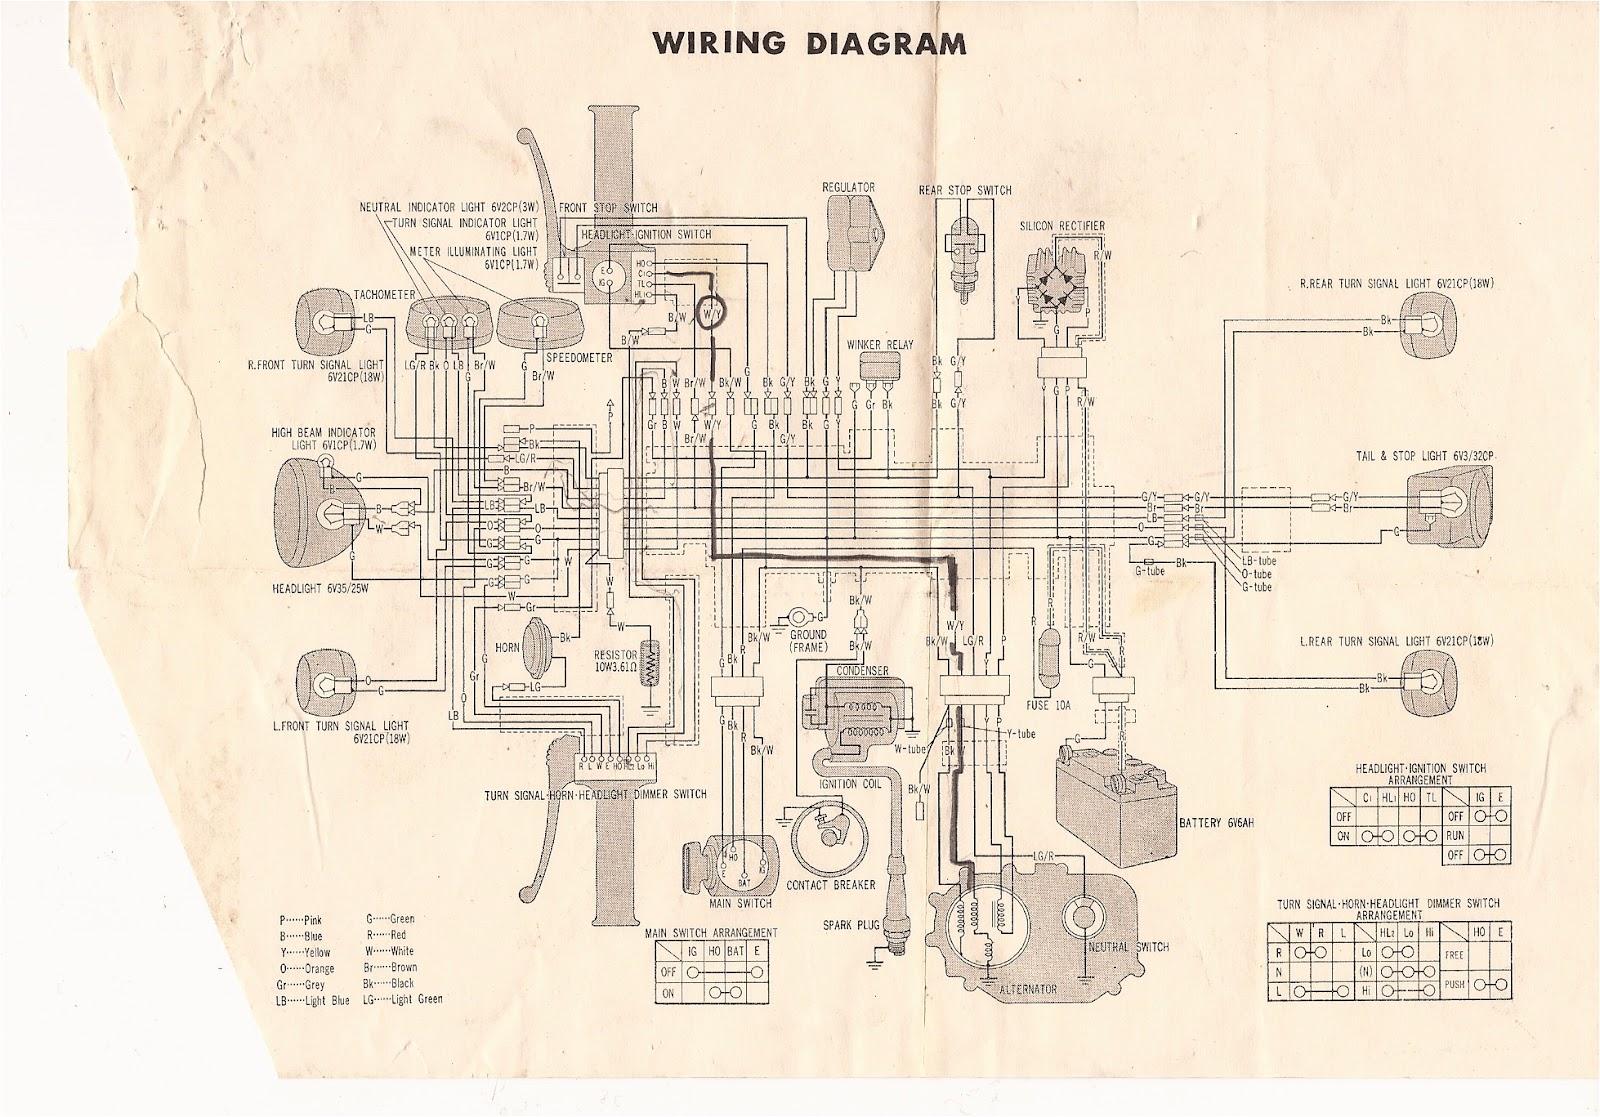 Surprising Honda Mr50 Wiring Diagram Wiring Library Wiring Cloud Onicaalyptbenolwigegmohammedshrineorg